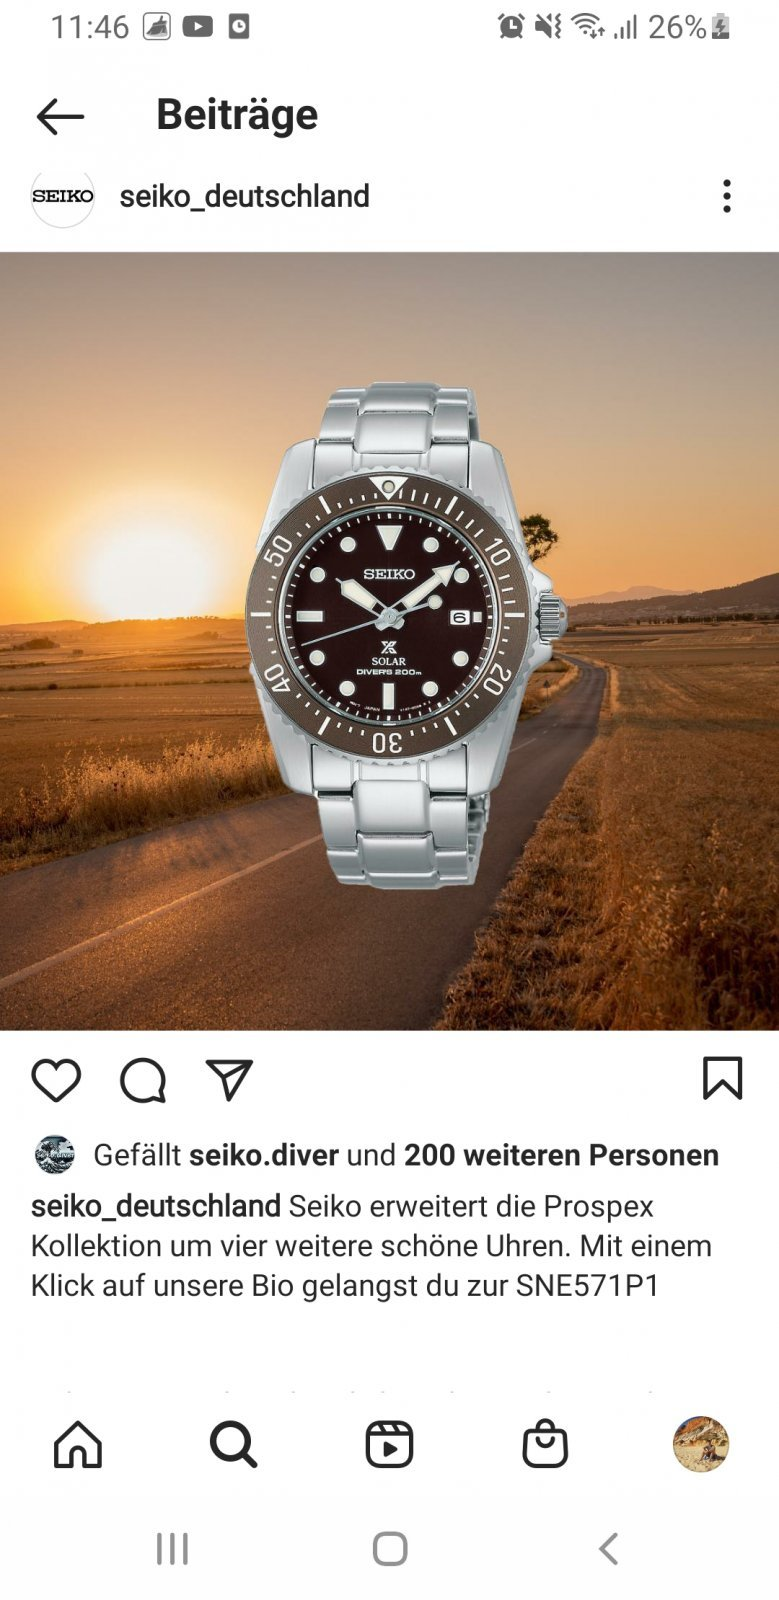 Screenshot_20210610-114602_Instagram.jpg